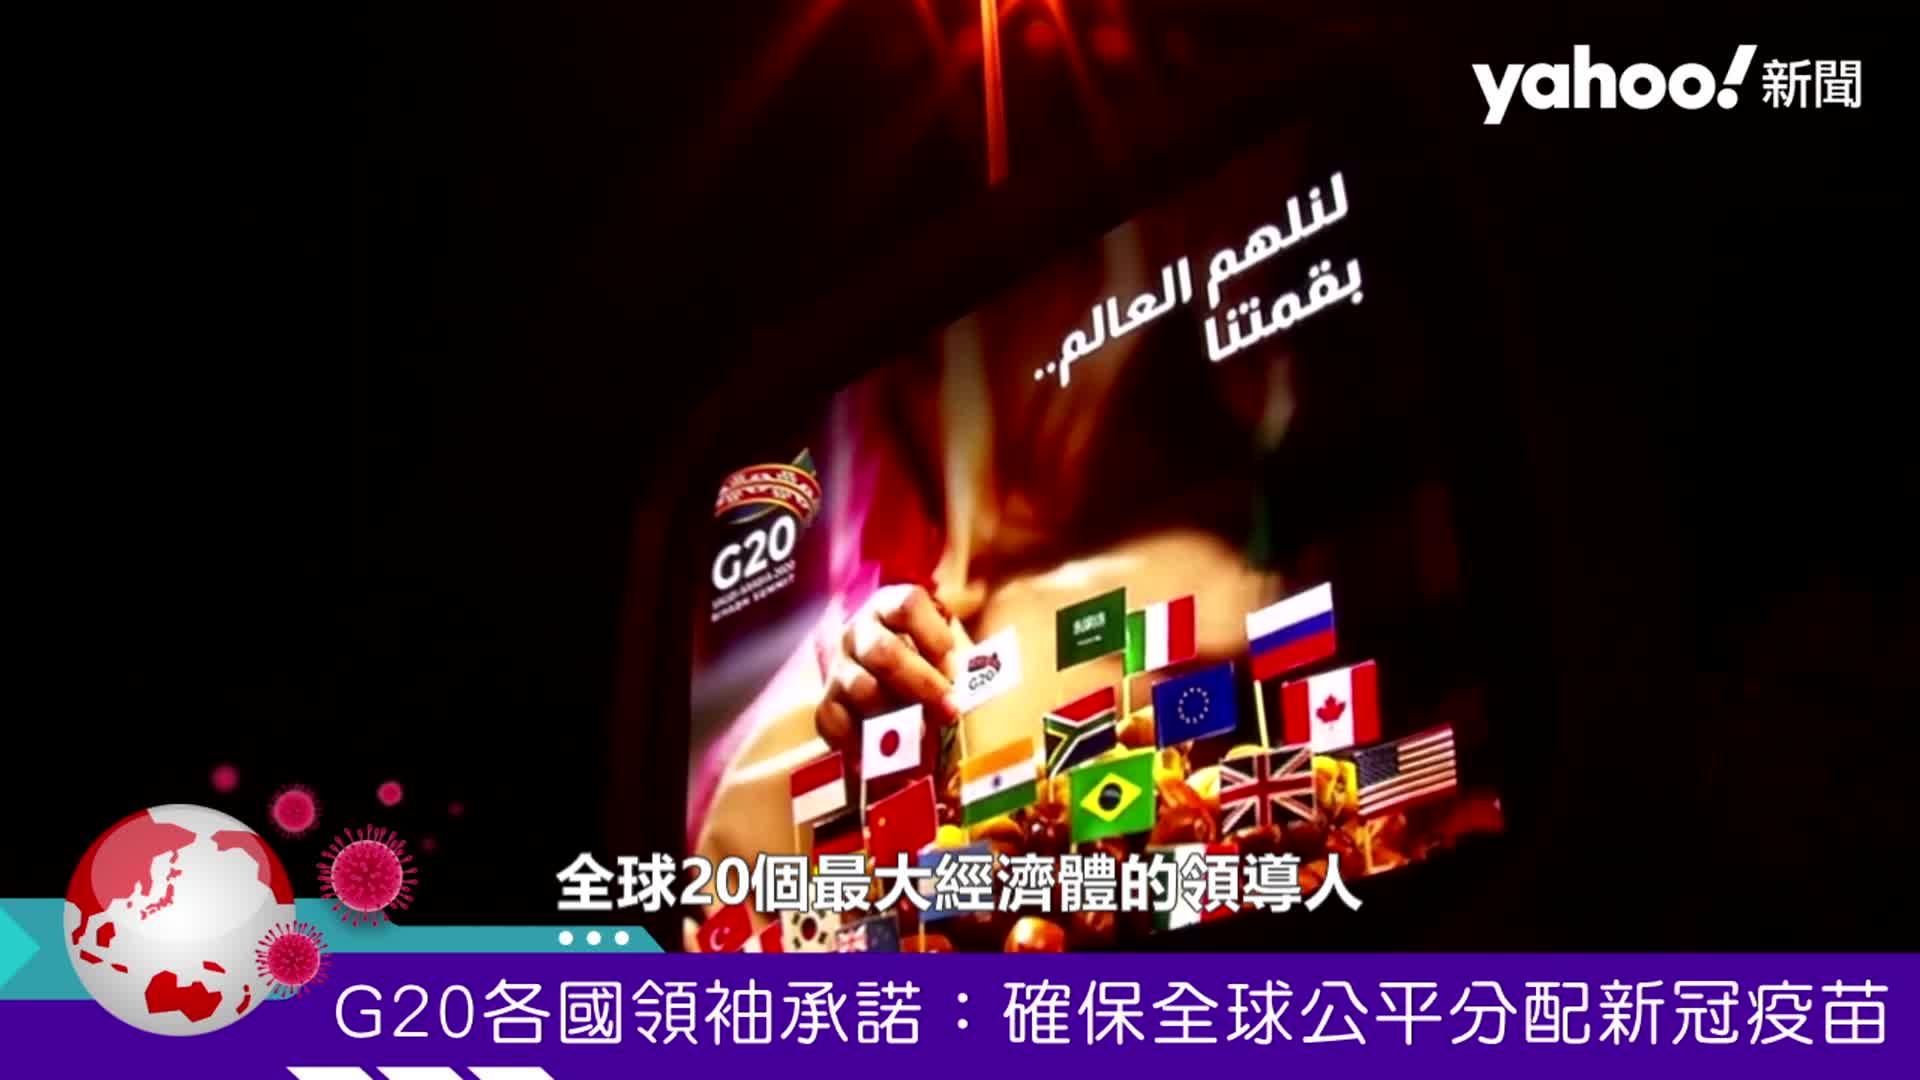 G20各國領袖承諾:確保全球公平分配新冠疫苗